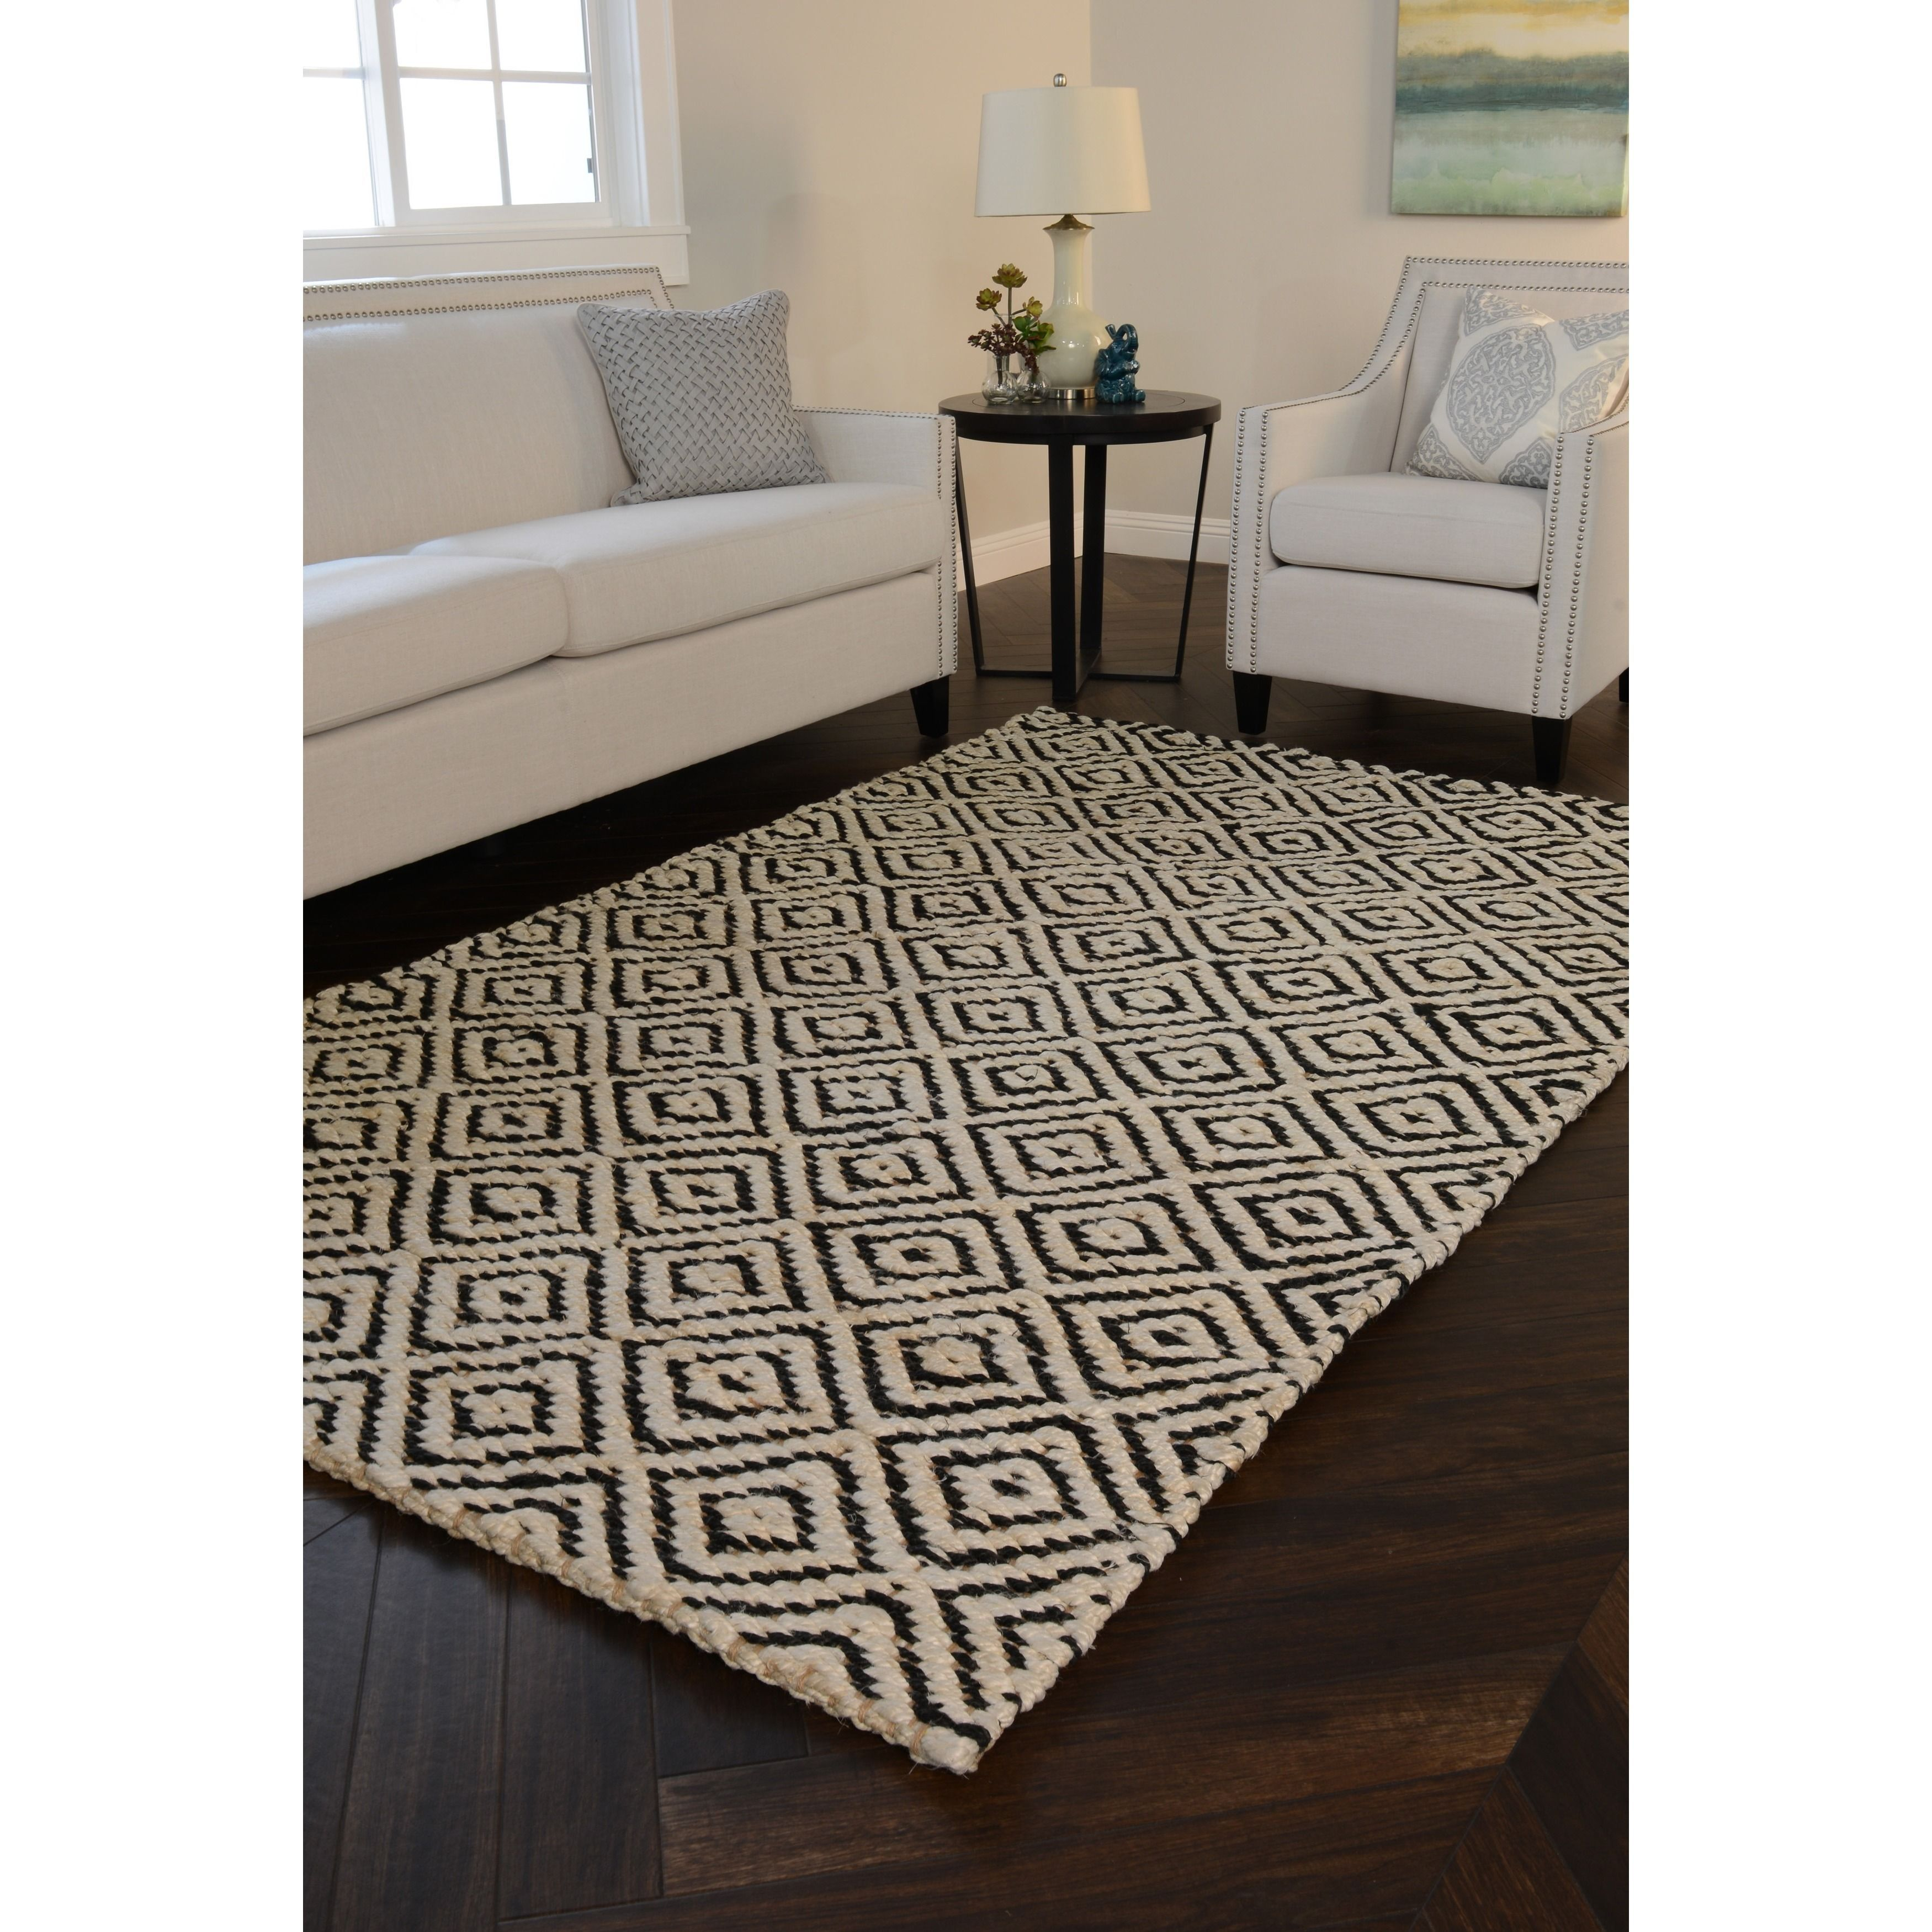 rug for living room size%0A Kosas Home Handwoven Kali Jute Black and Bleached Rug    u     x   u